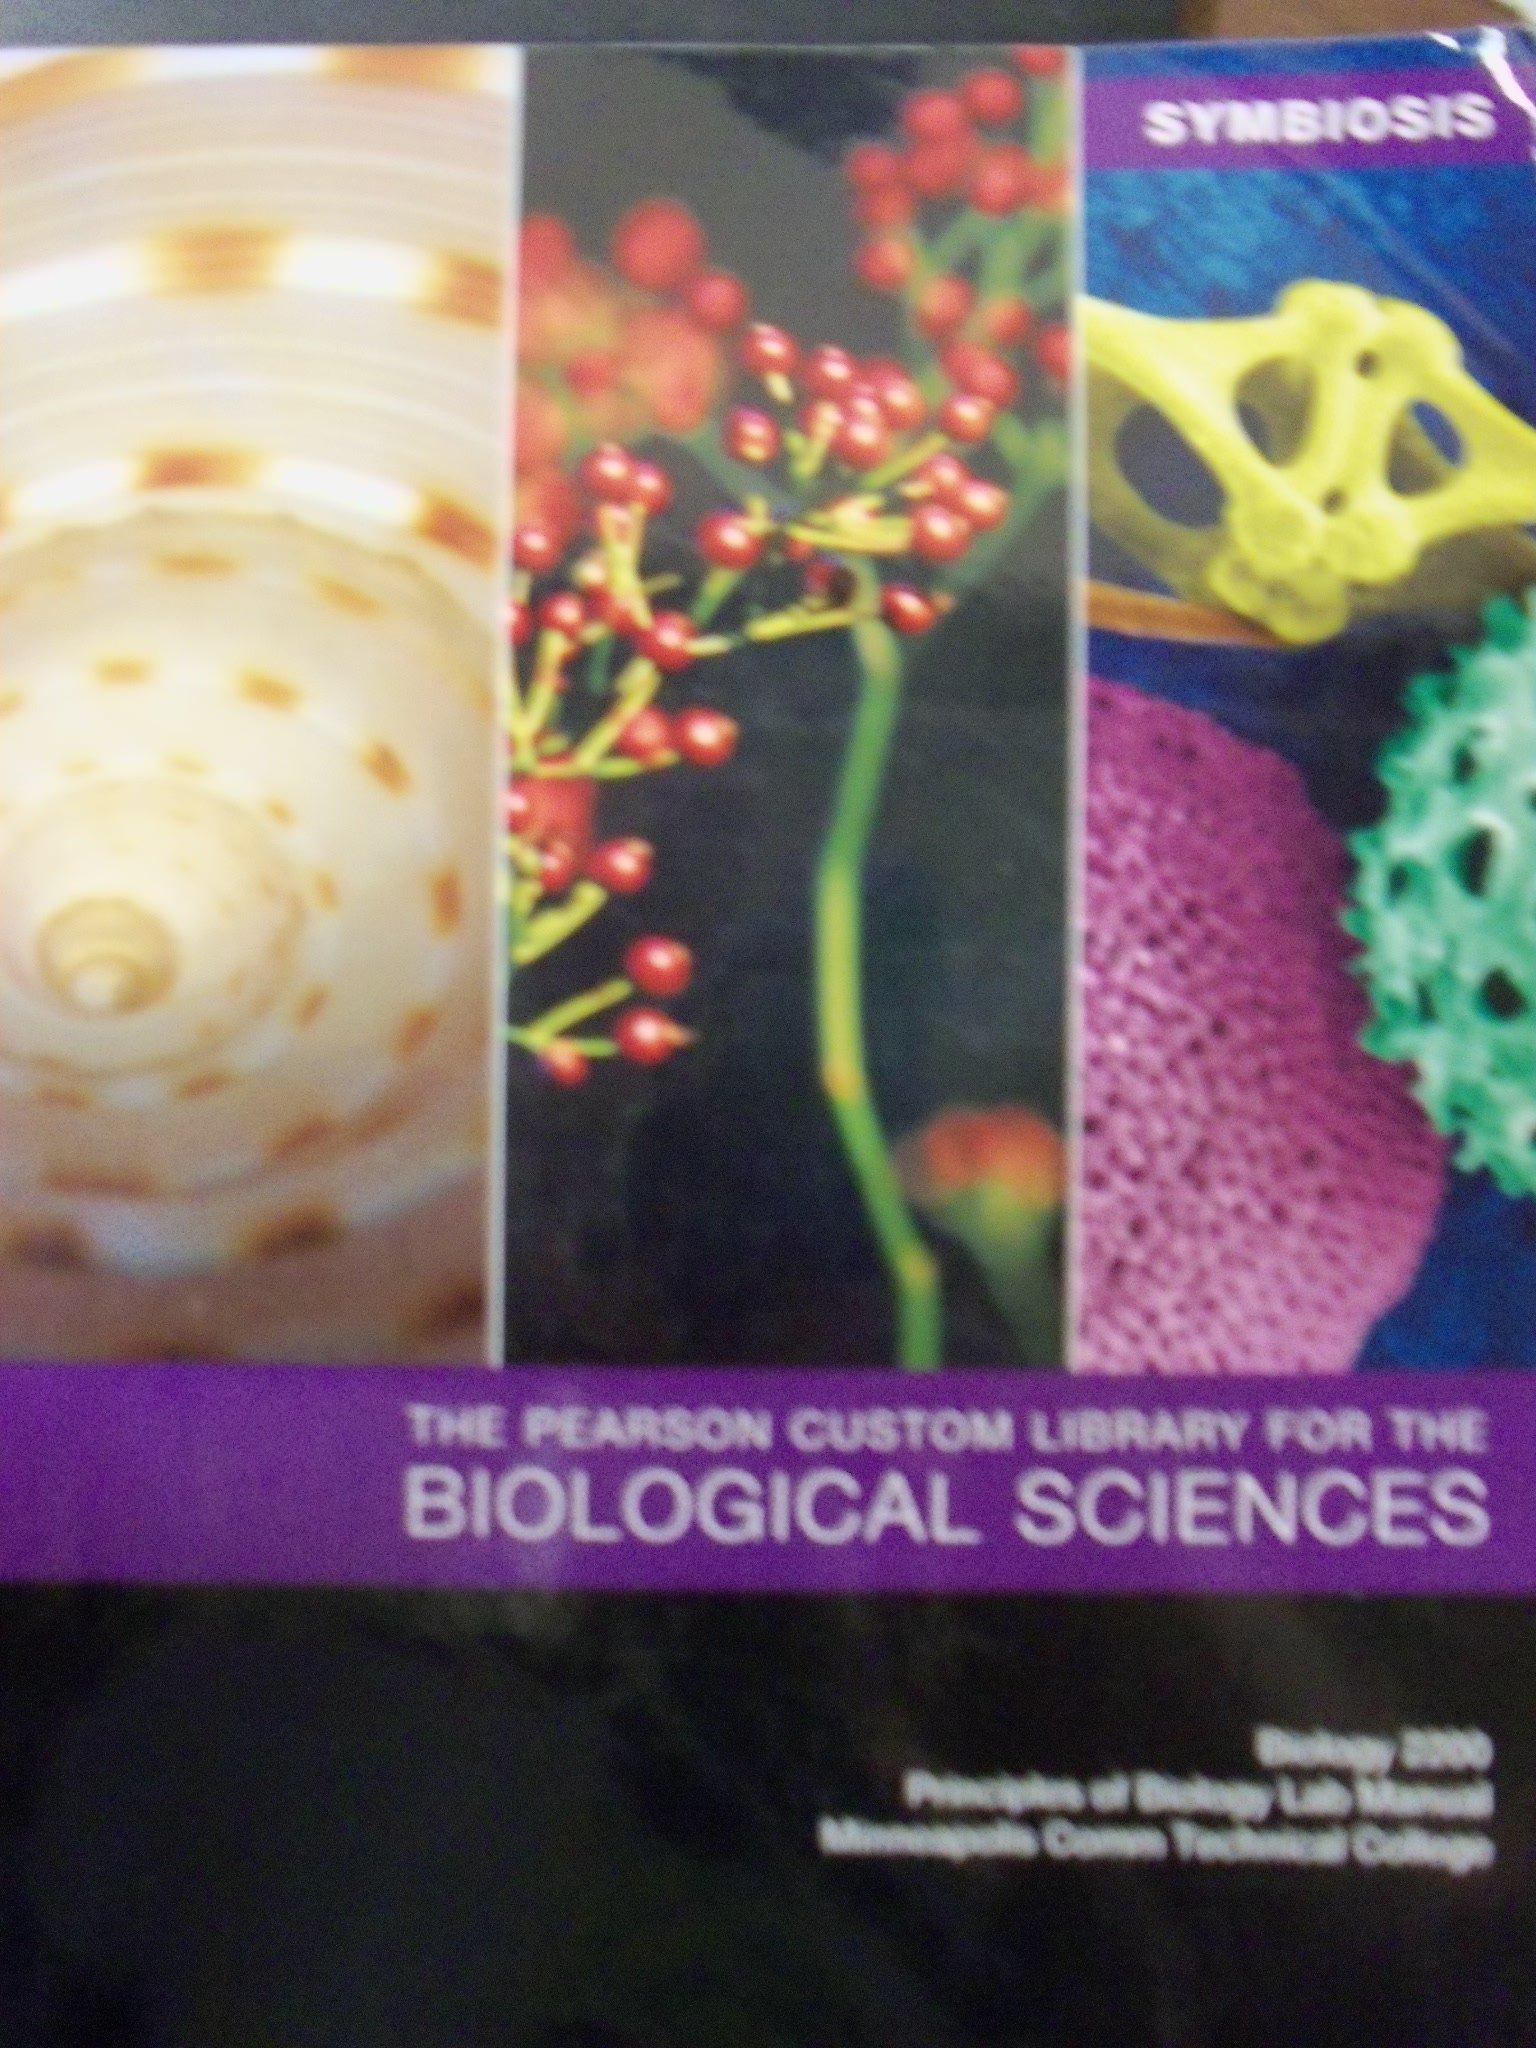 symbiosis the pearson custom library for the biological sciences rh amazon com Doris Pearson 5 Star Pearson Education Logo